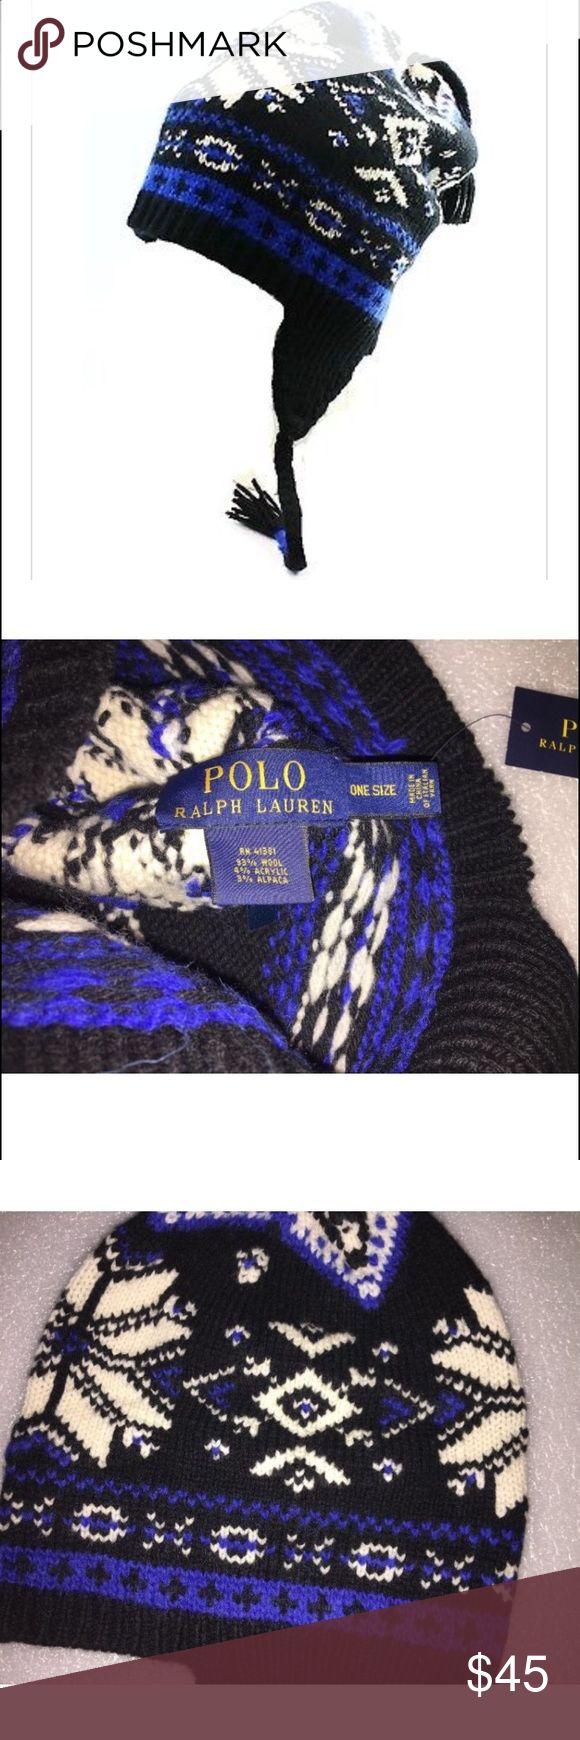 POLO RALPH LAUREN NEW Black One Size Beanie POLO RALPH LAUREN NEW Black One Size Beanie Snowflake Wool Winter Hat Polo by Ralph Lauren Accessories Hats